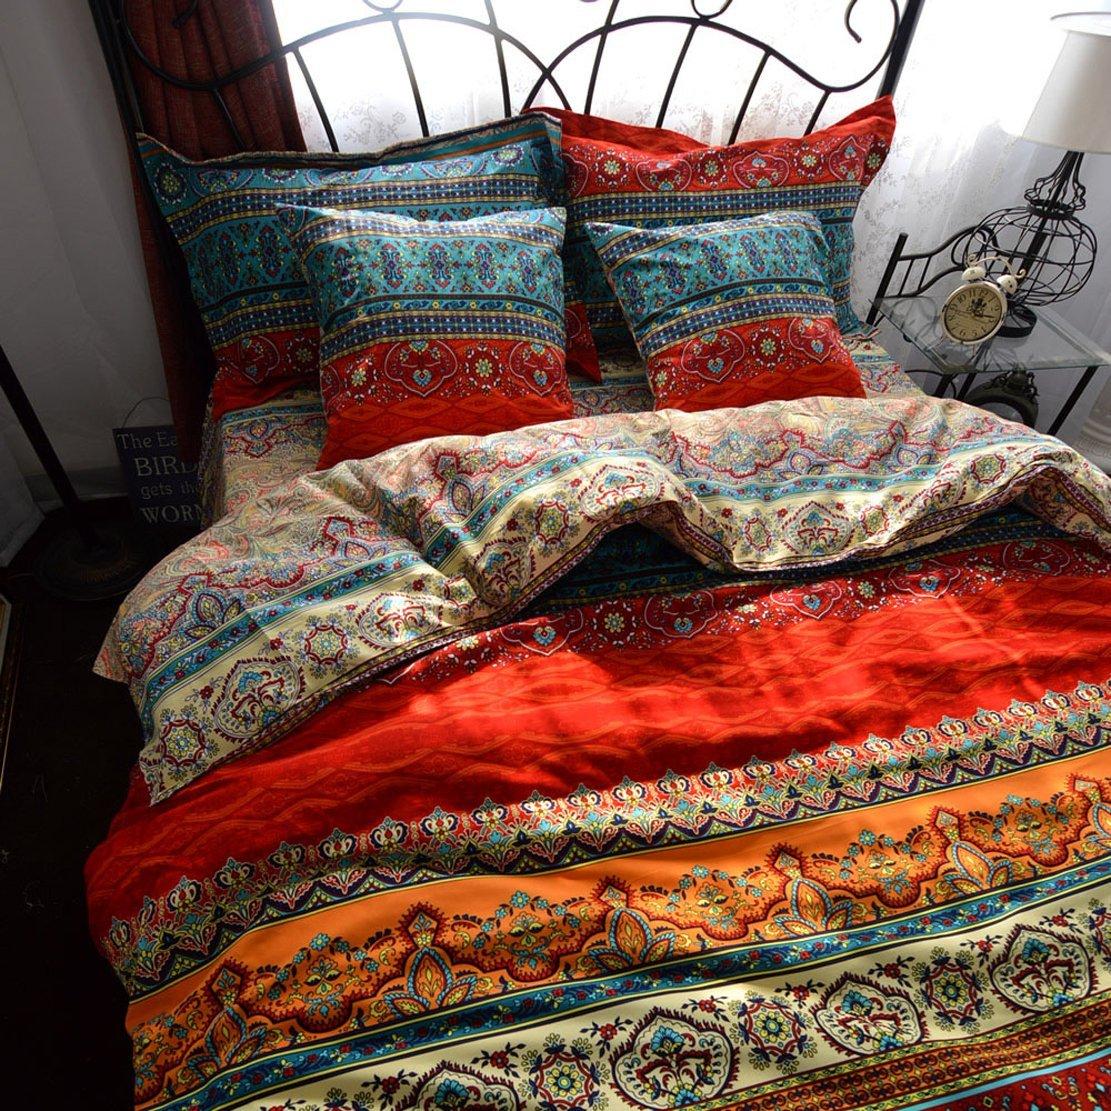 colorful duvet covers king Amazon.com: MAXYOYO New!Boho Style Duvet Cover Set,Colorful Stripe  colorful duvet covers king